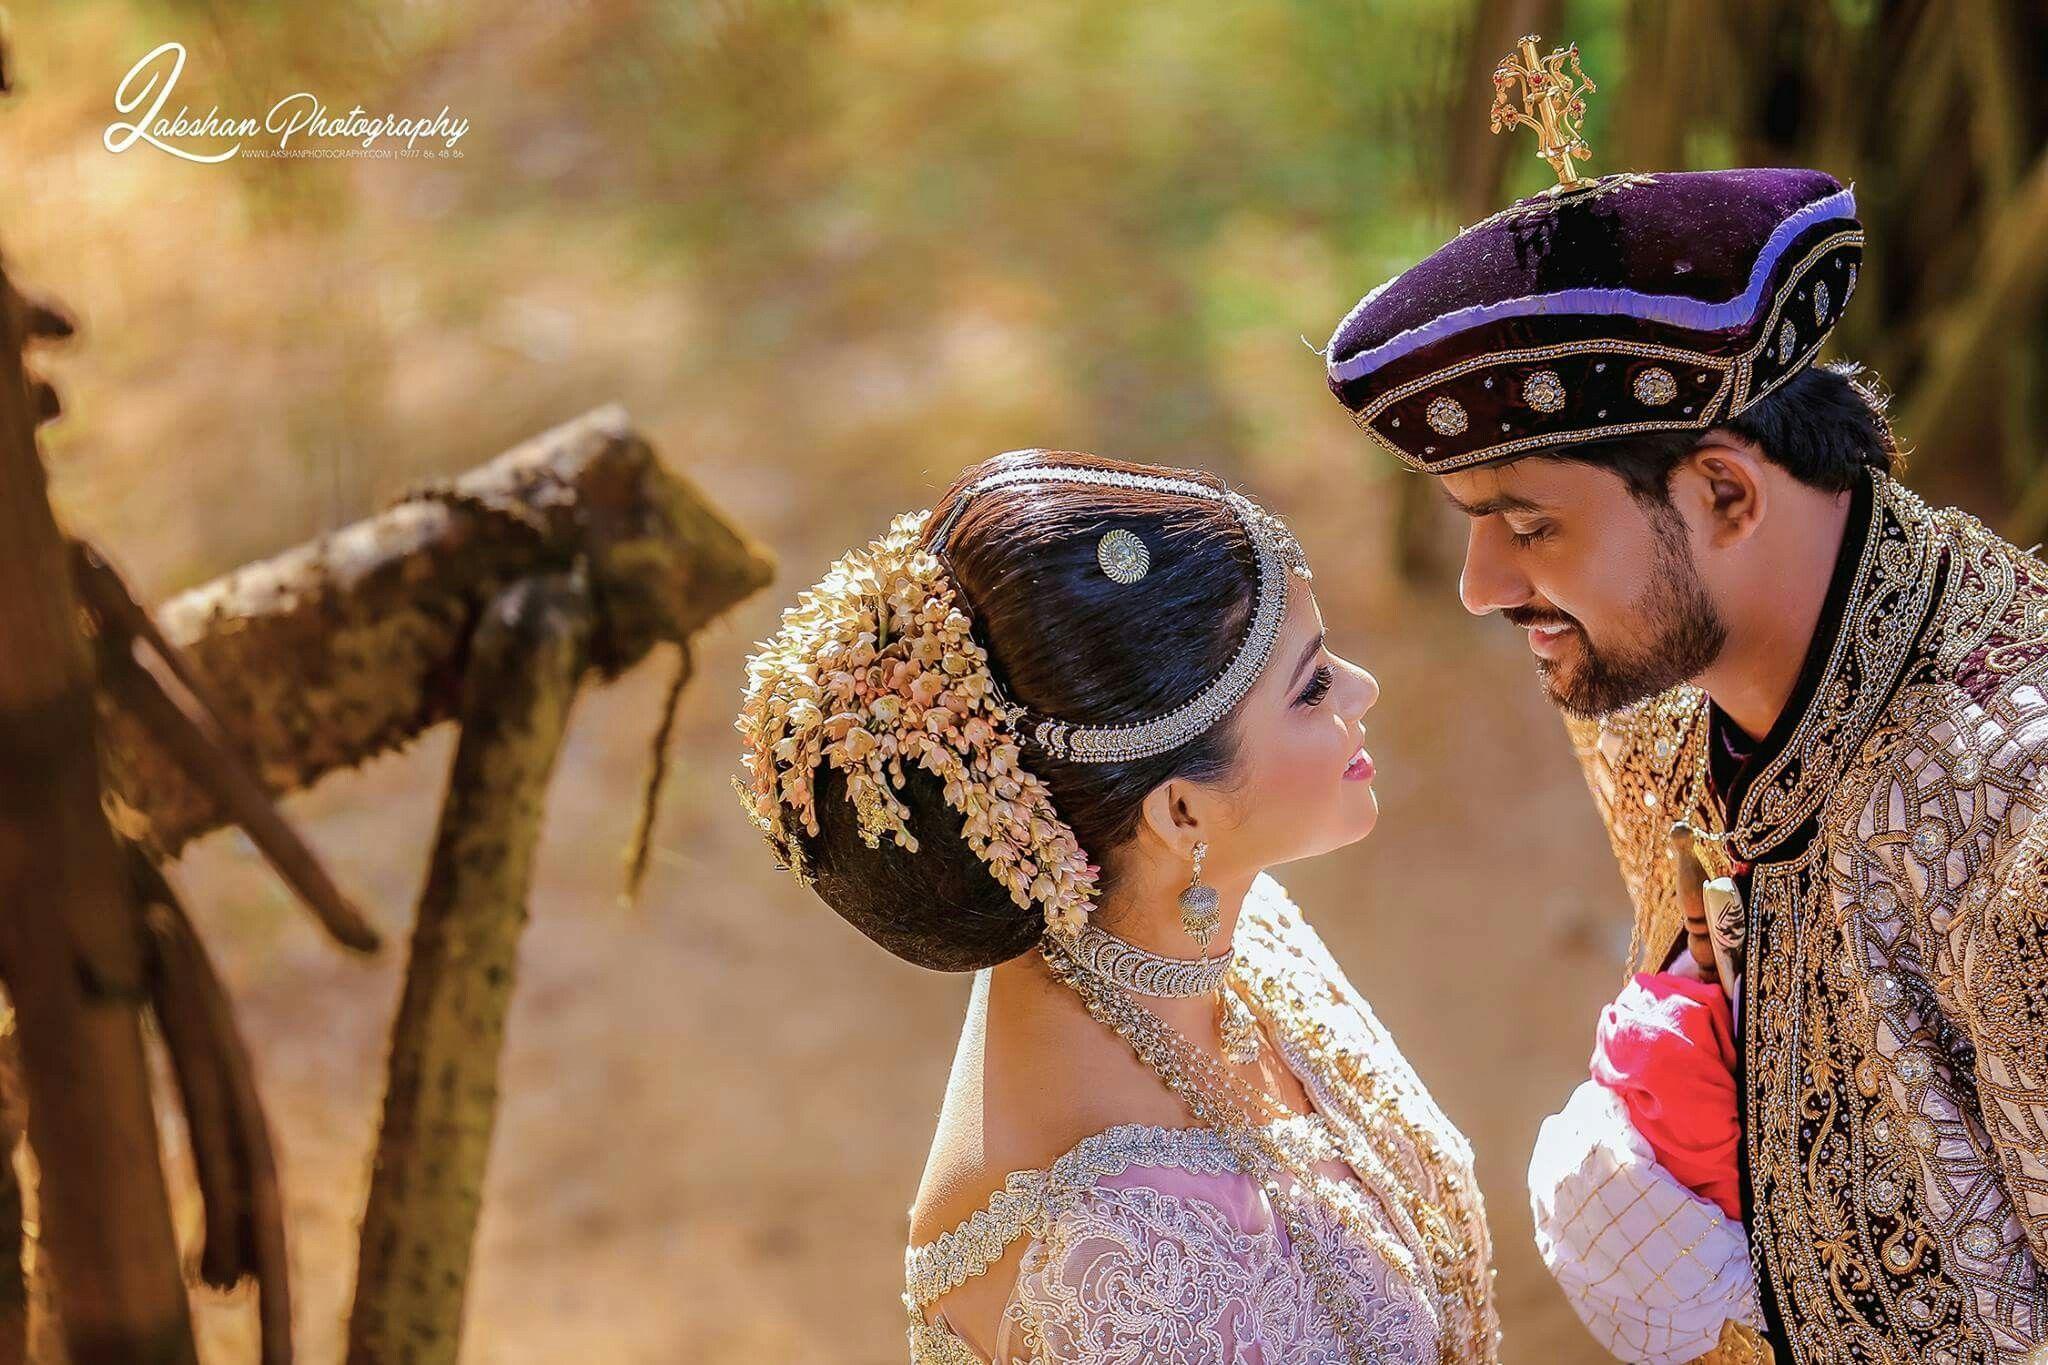 Pin By Malki Thathsarani On Wedding Album Bridal Wear Wedding Sari Srilankan Wedding